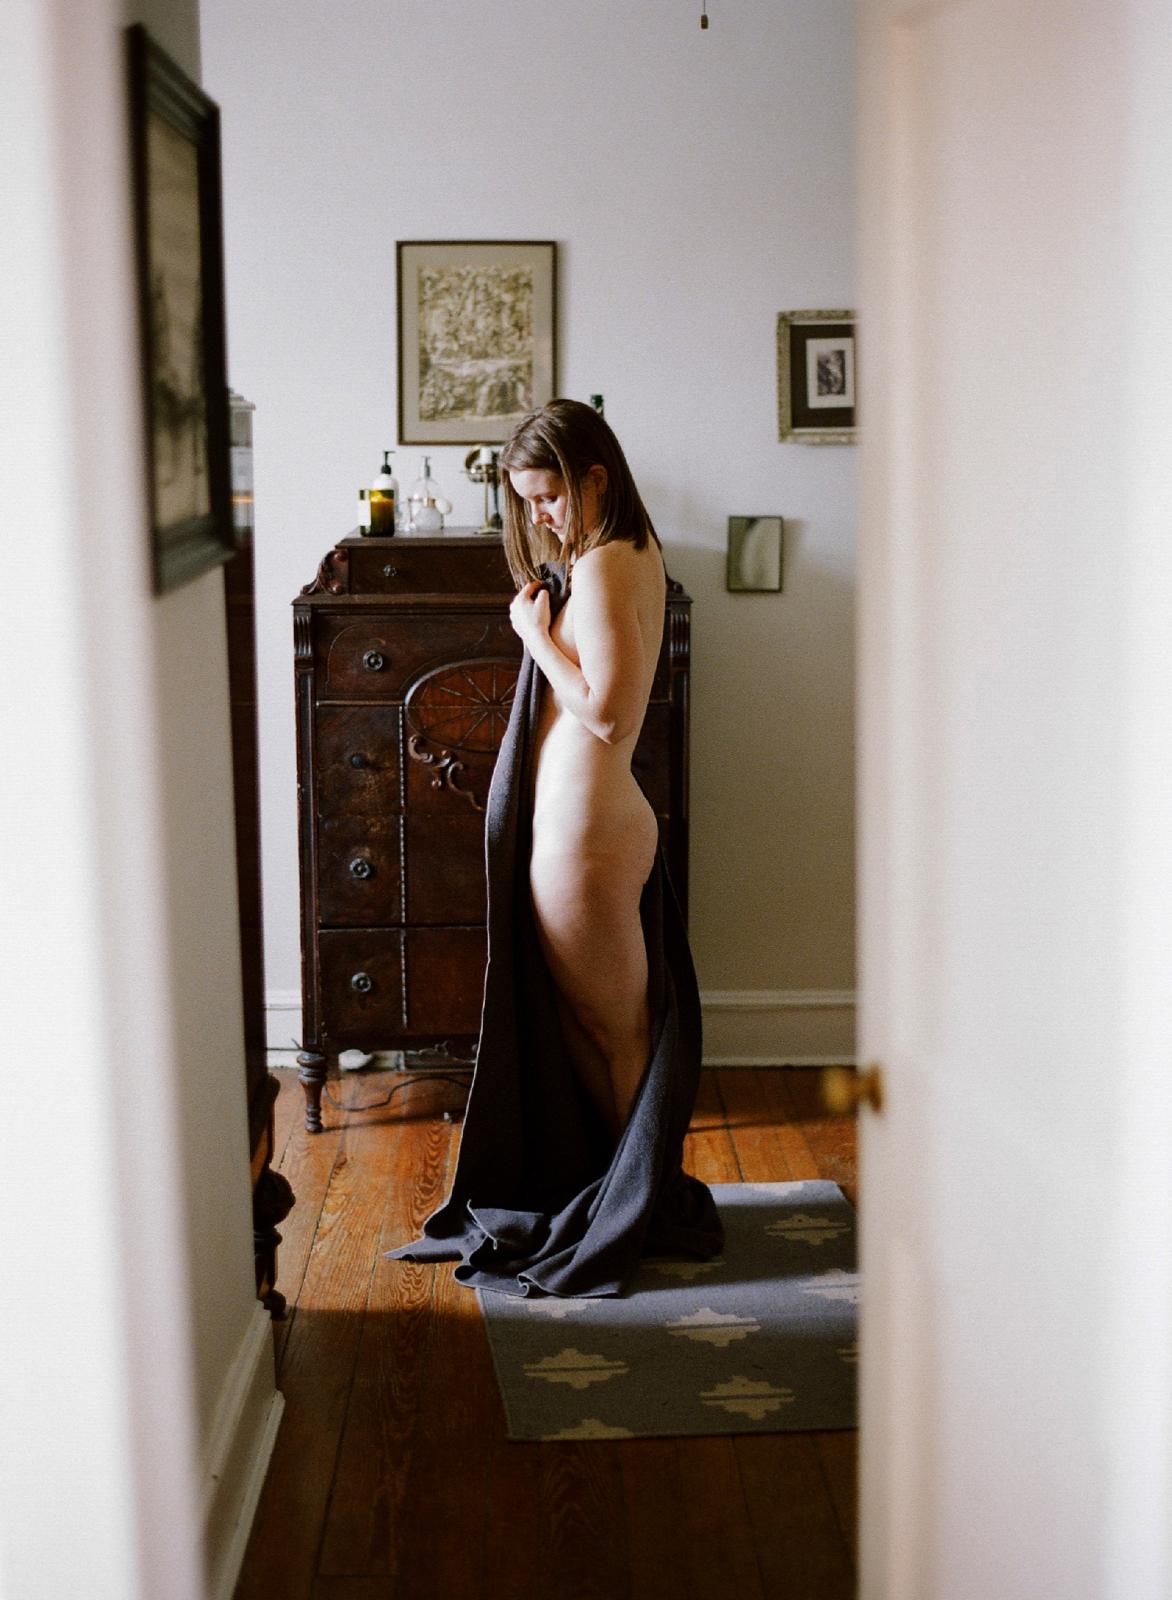 moody fine art boudoir photographer annapolis maryland boudoir photographer shannon griffin_0004.jpg